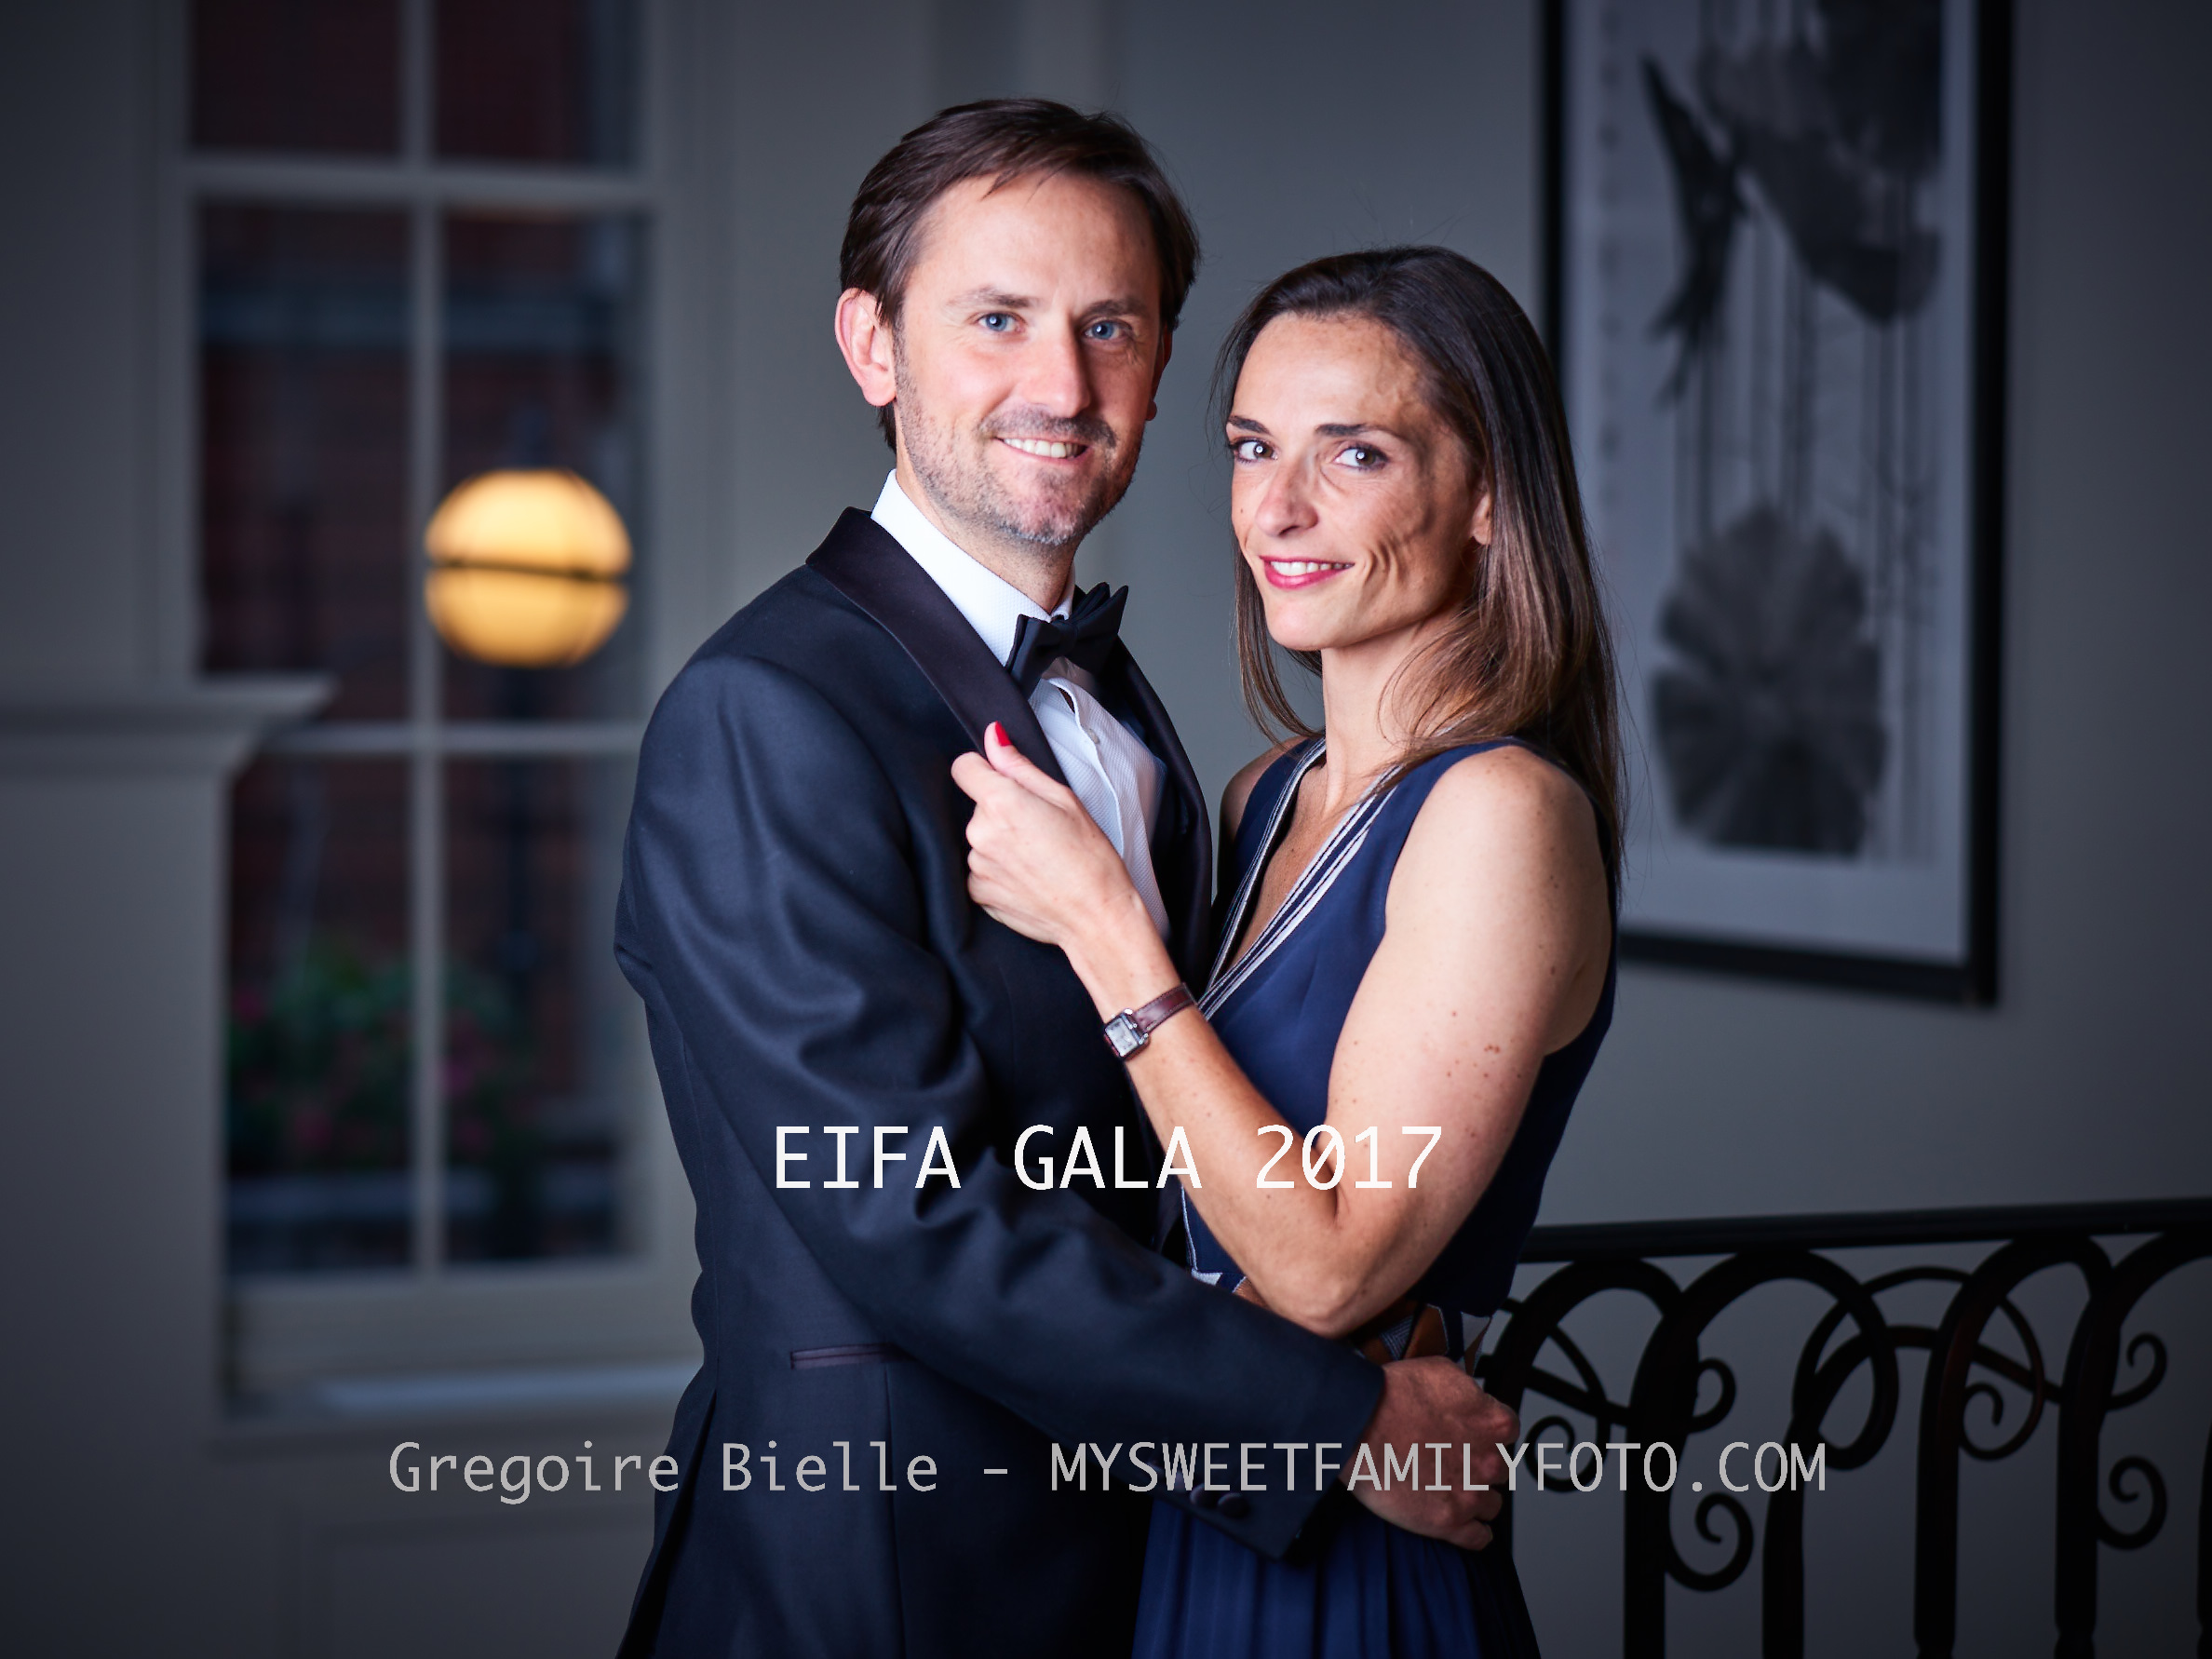 EIFA GALA 1125.jpg